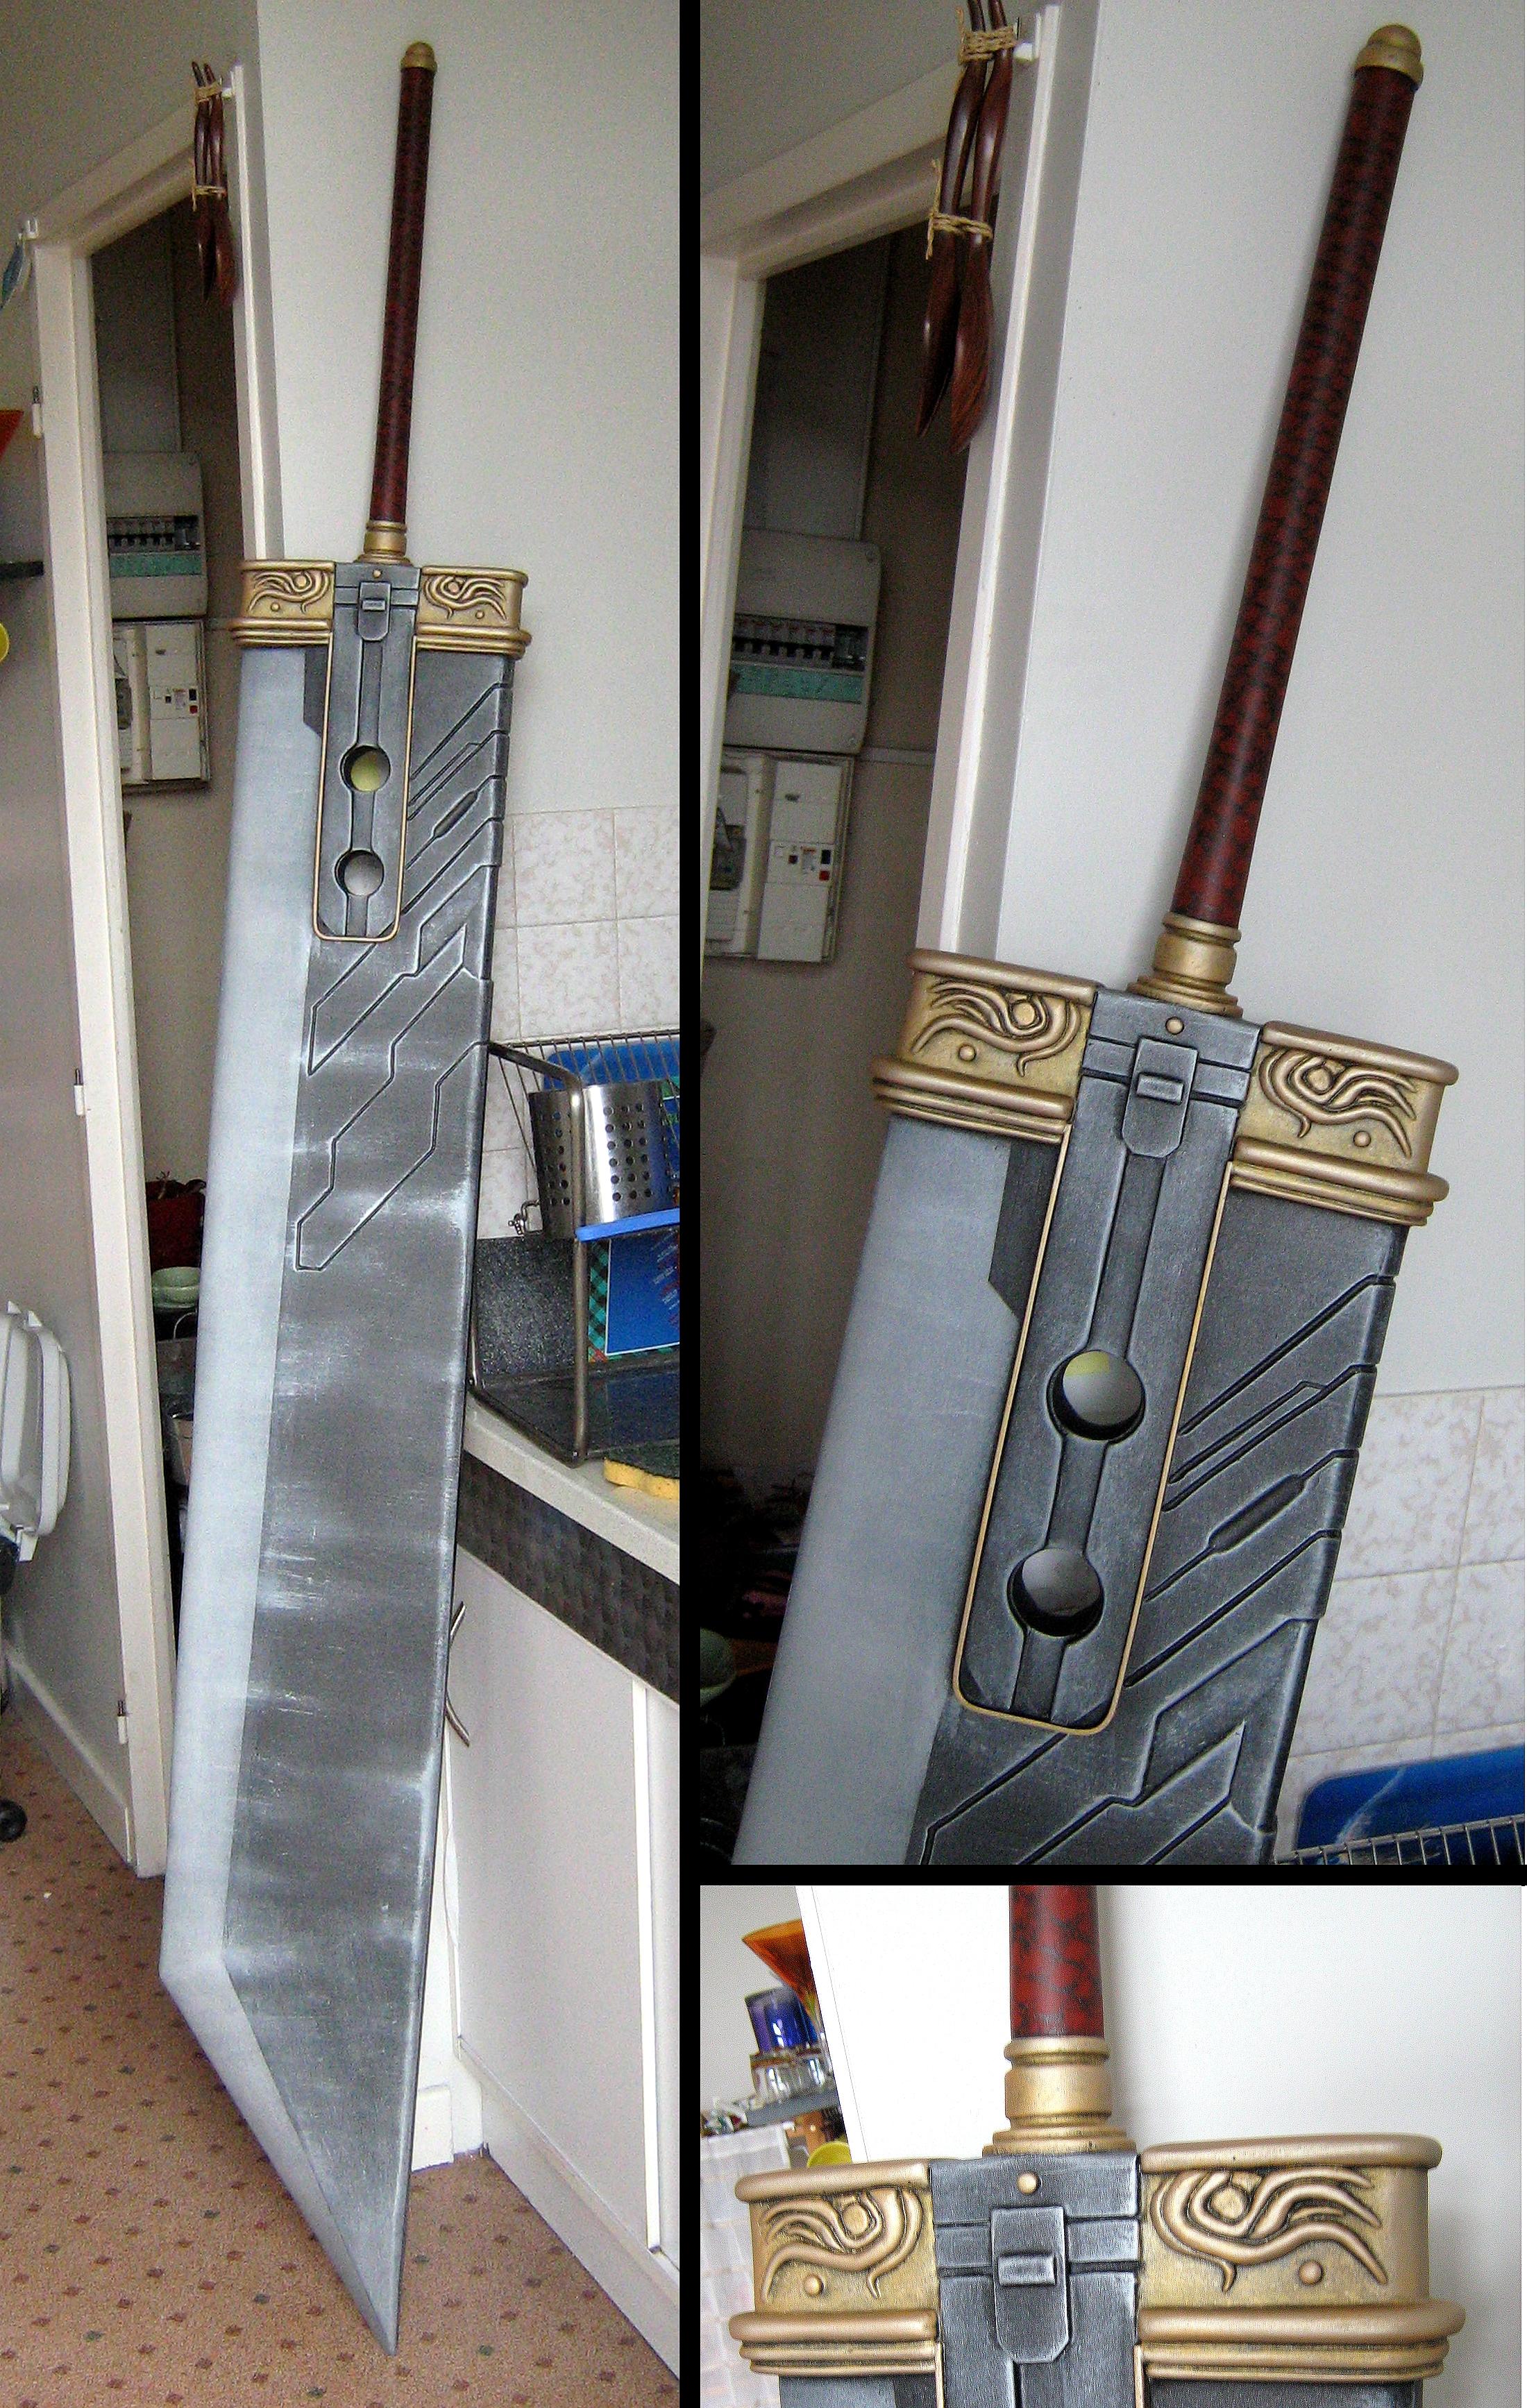 Cloud Strife's Buster Sword by Kaze-The-Dark-Wind on DeviantArt